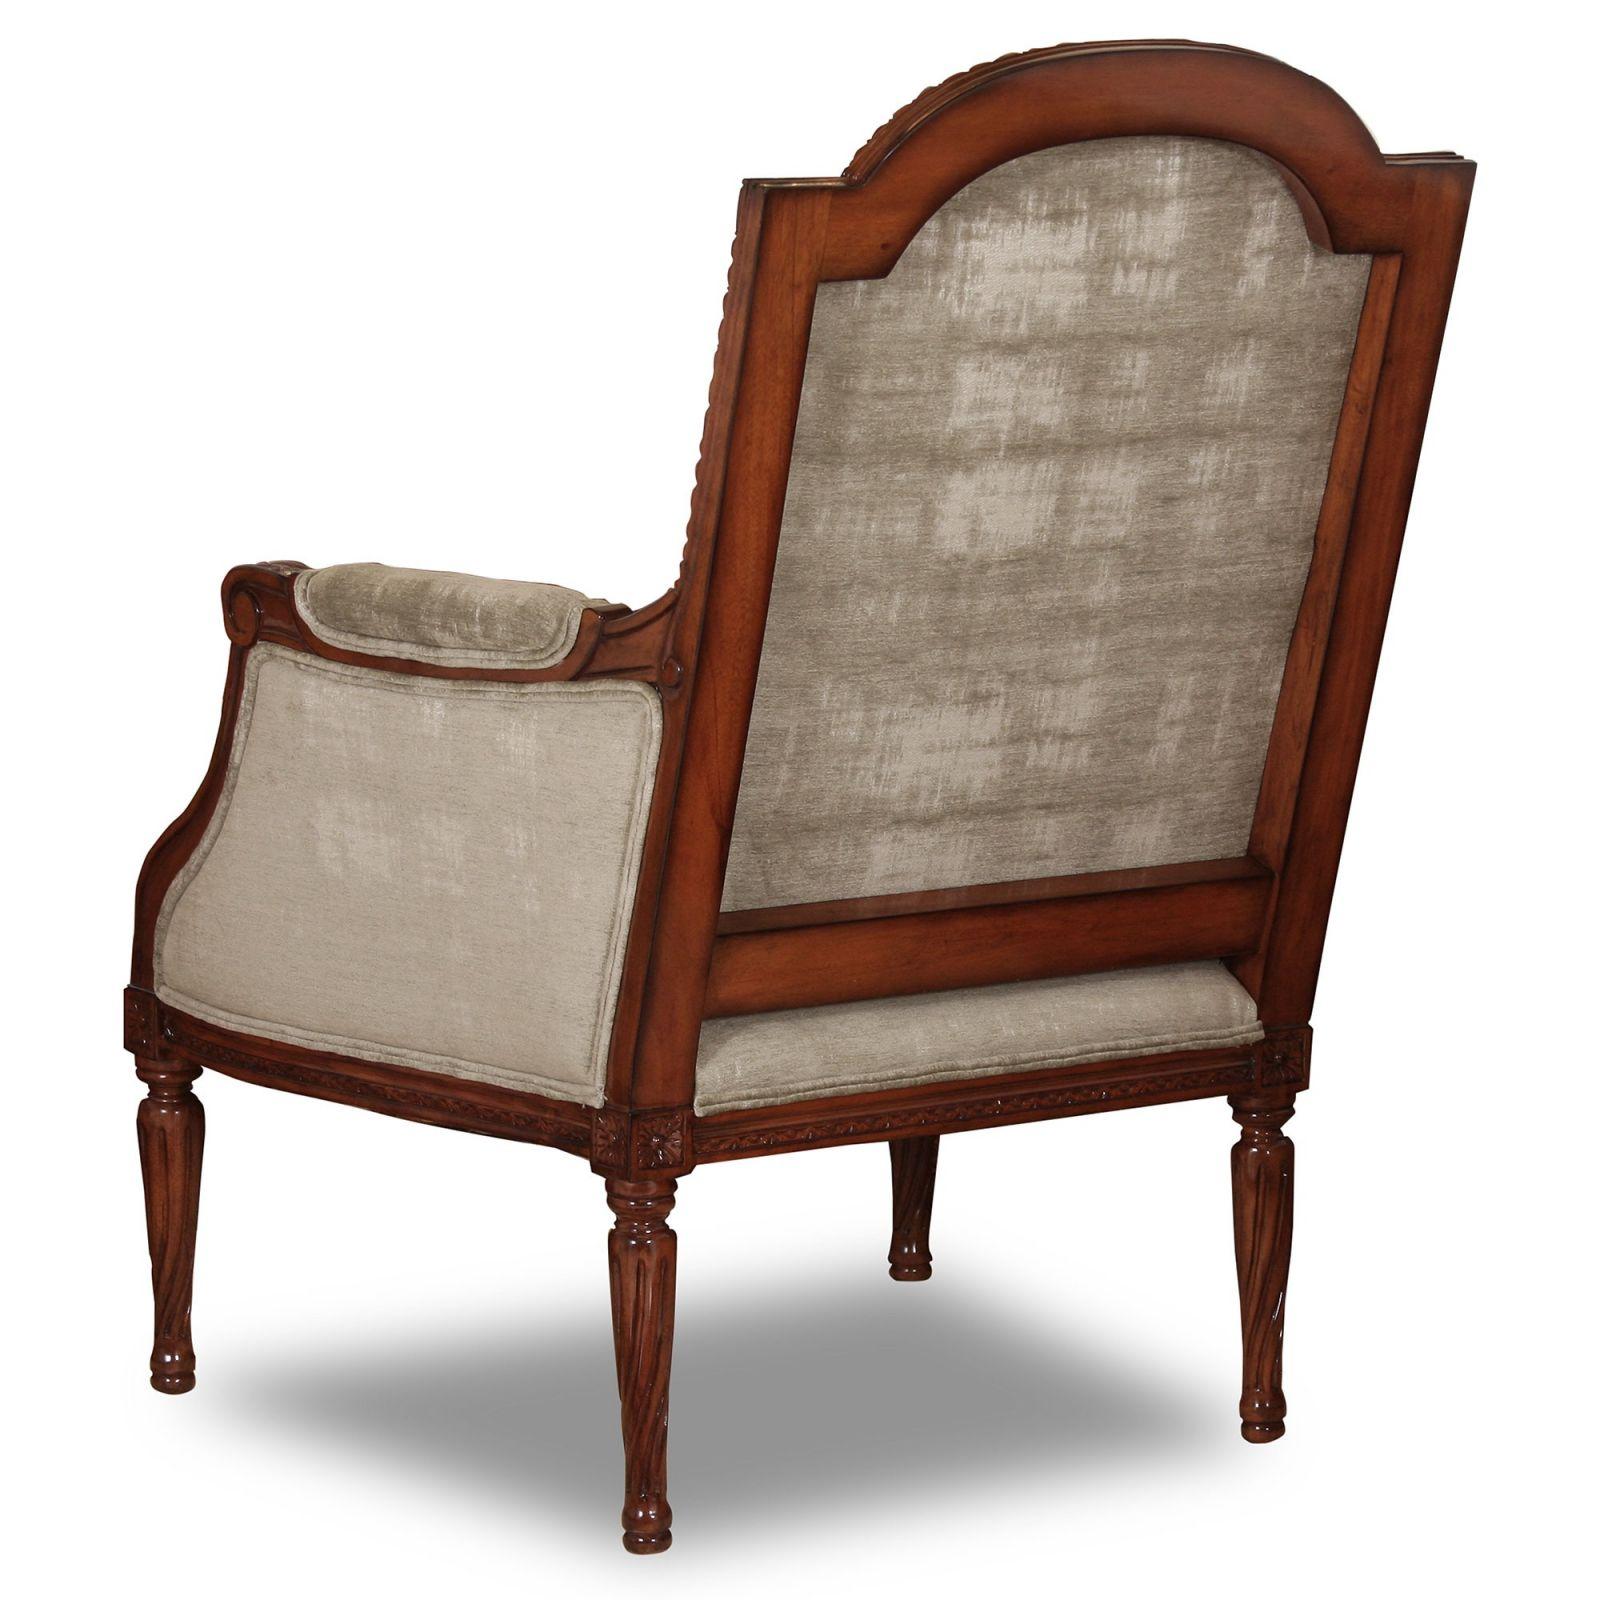 Alexander mahogany chair in worn grey velvet